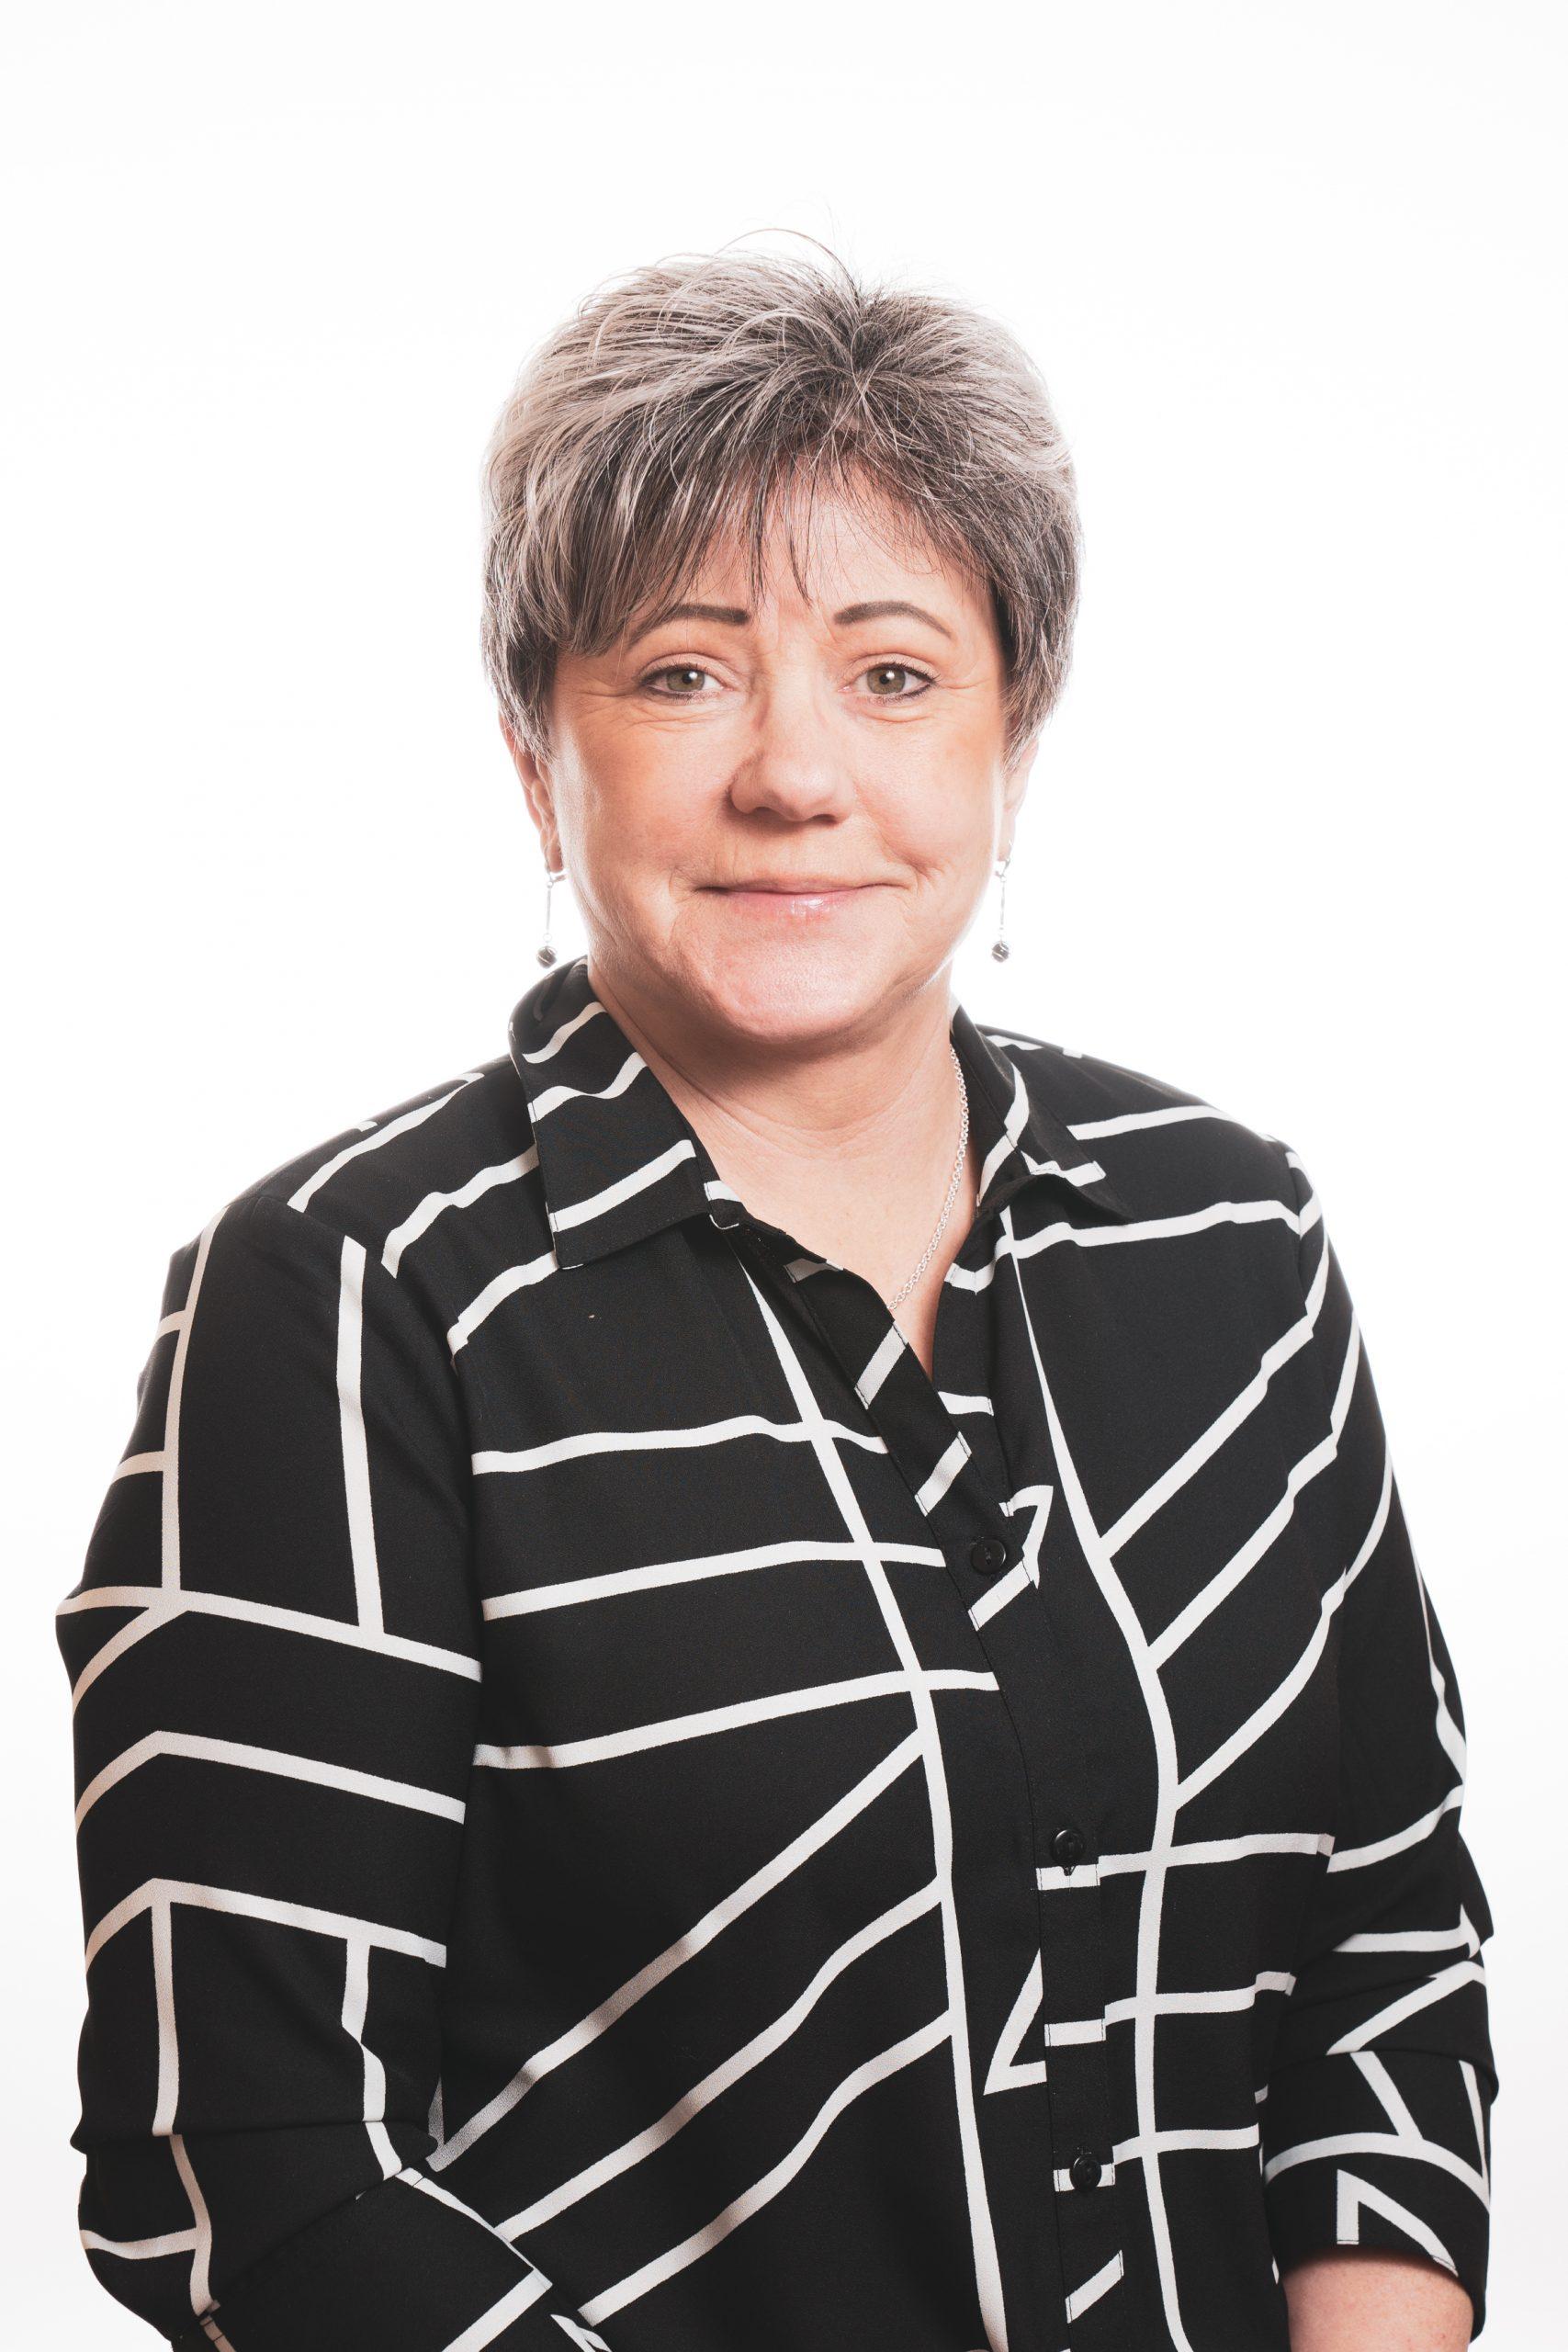 Caroline Ahlfeldt